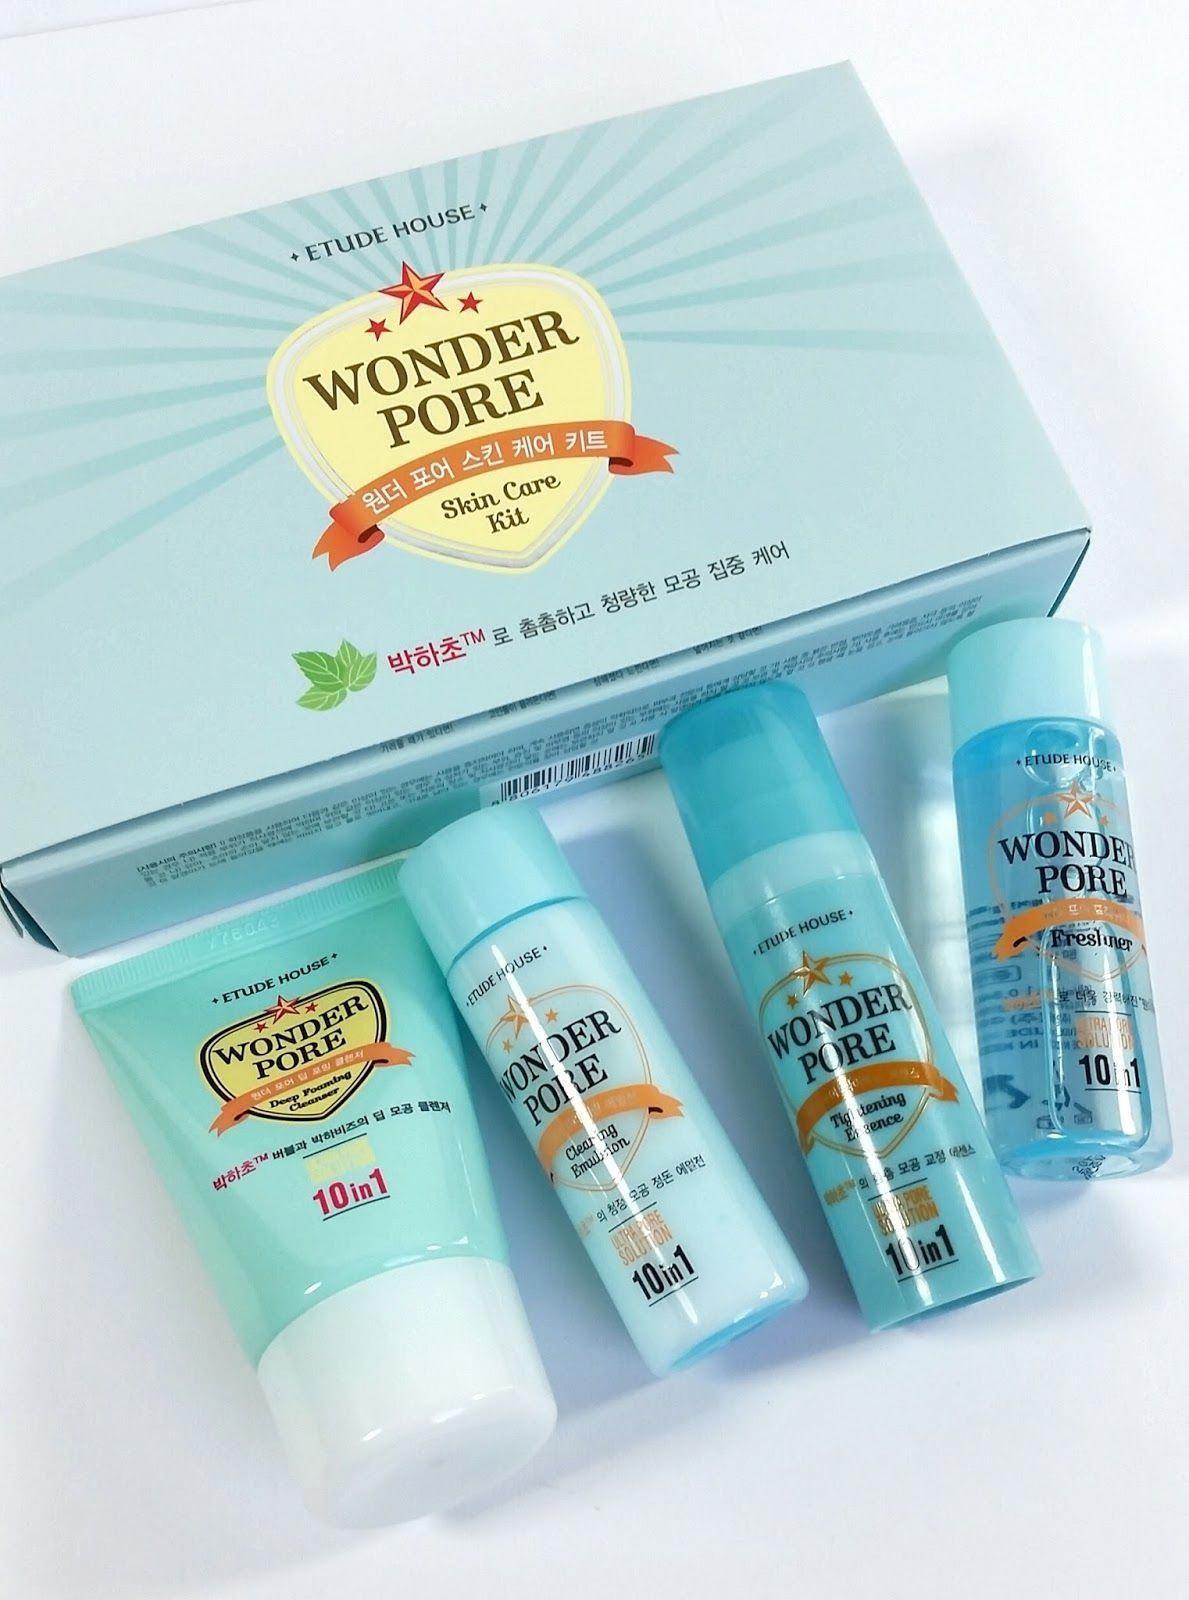 Etude House Wonder Pore Skin Care Kit